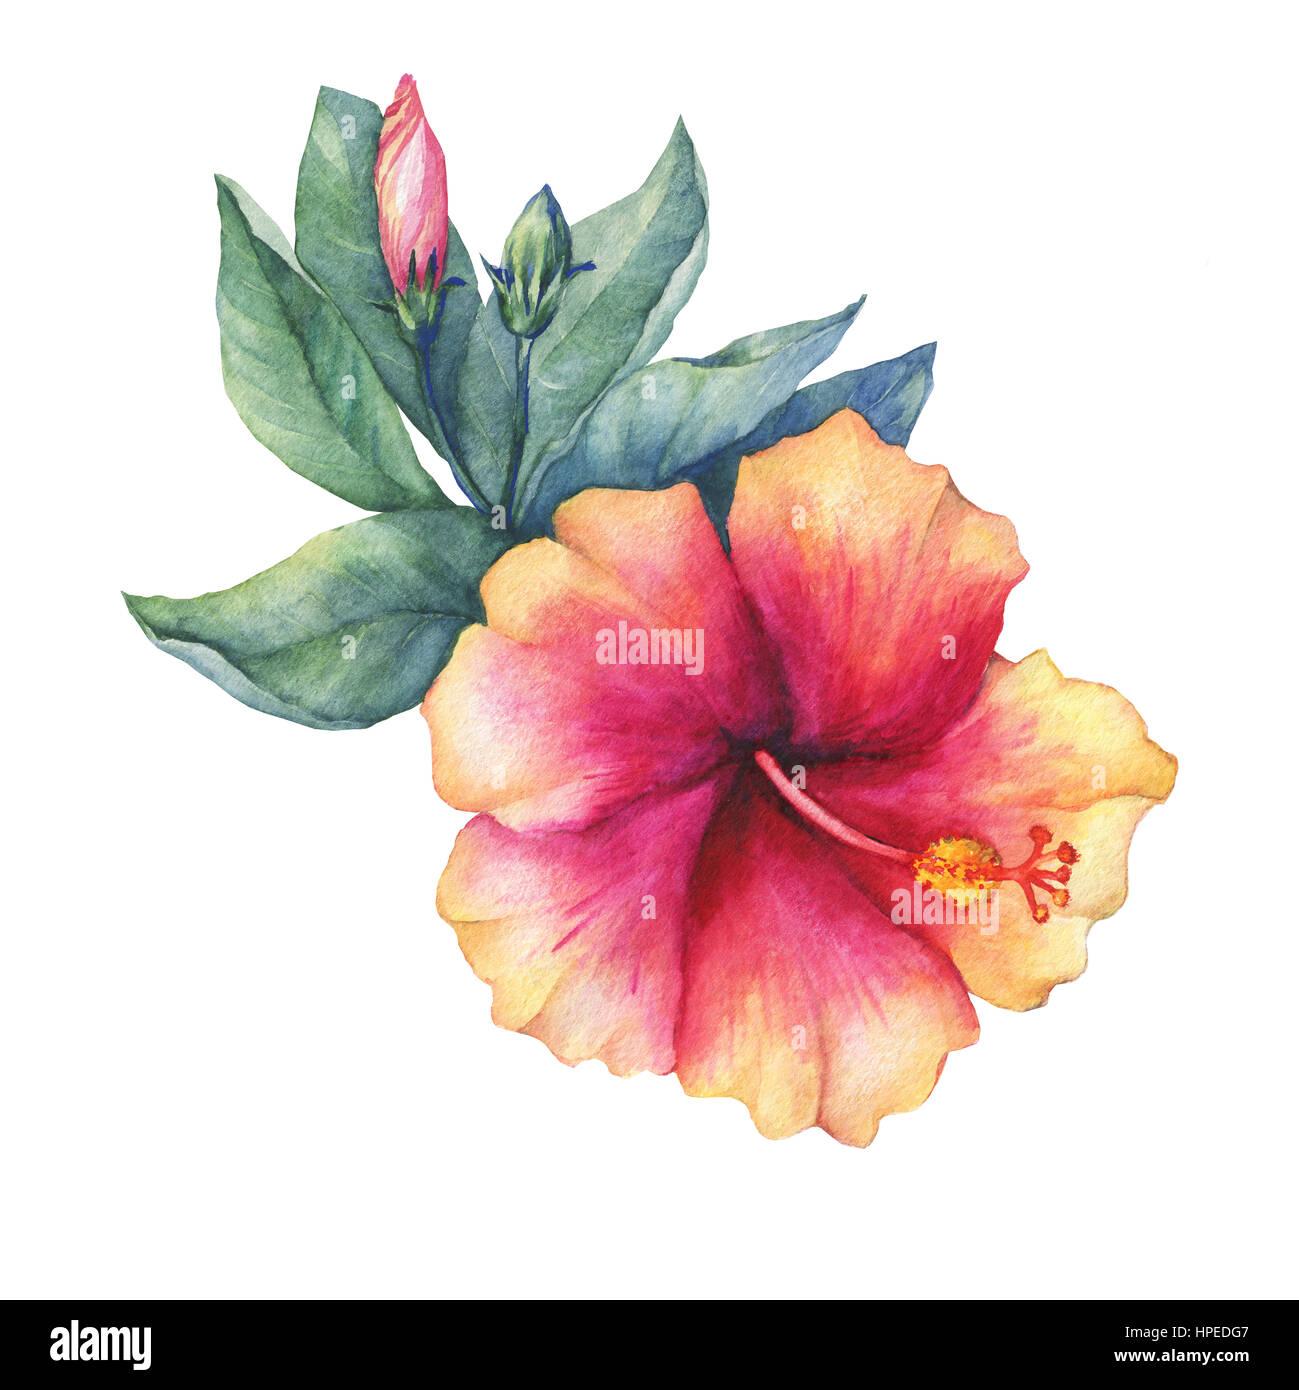 Peach pink hibiscus flower hand drawn watercolor painting on white peach pink hibiscus flower hand drawn watercolor painting on white background izmirmasajfo